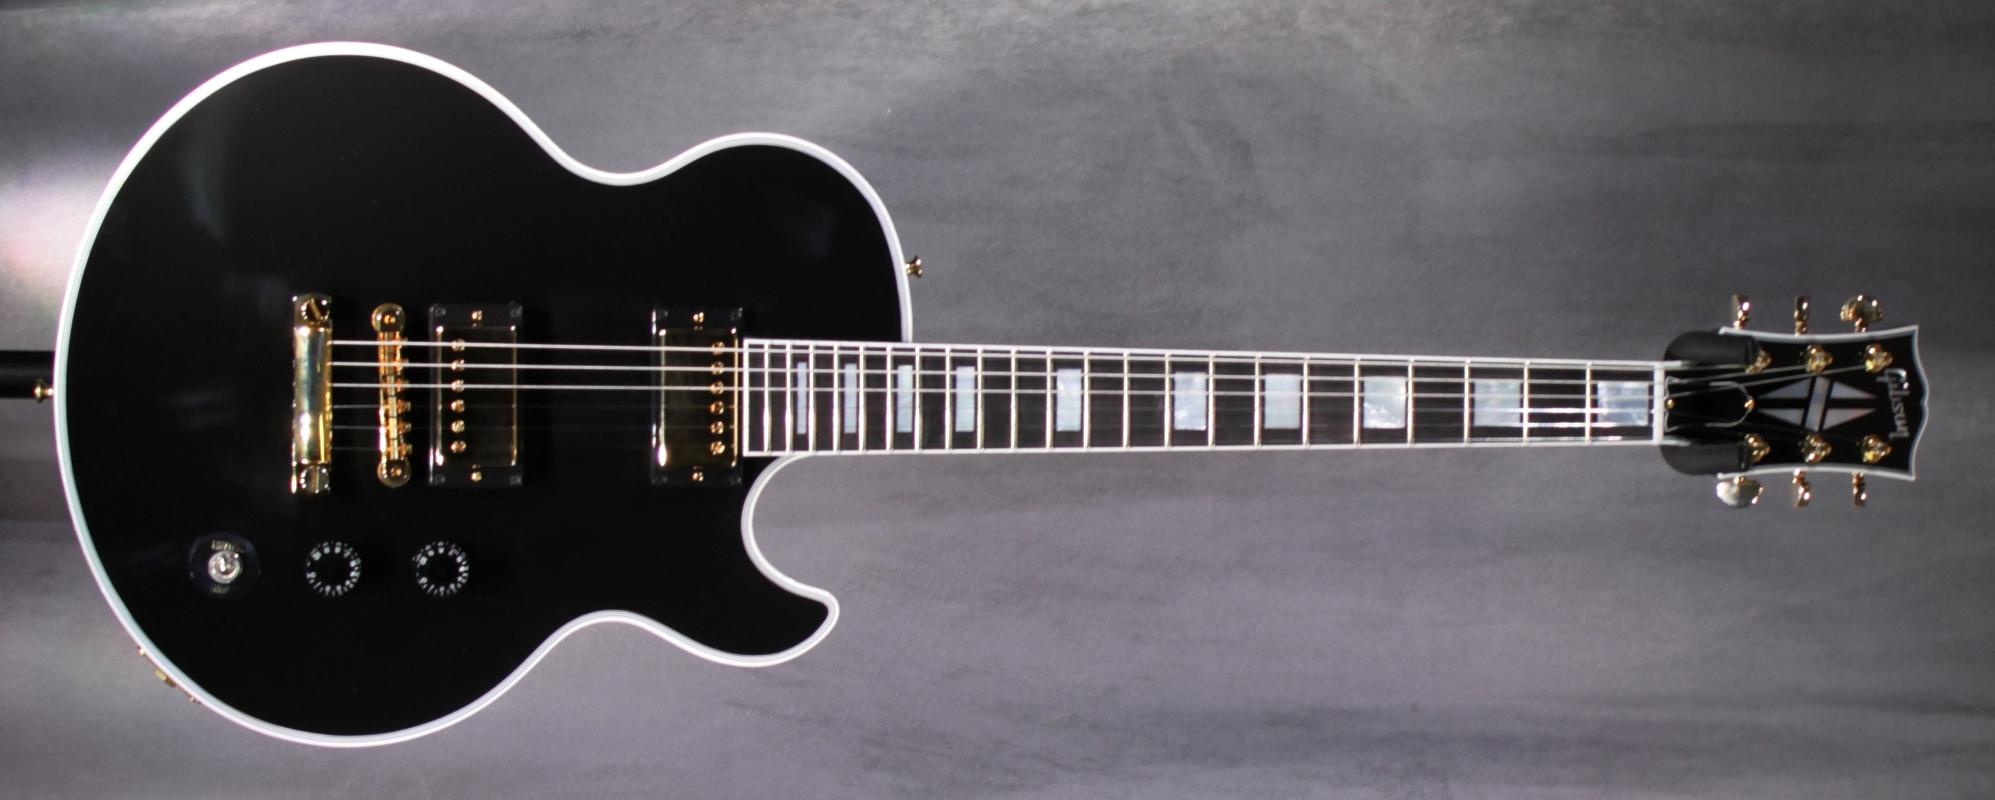 Gibson Custom Shop Ltd. Edition Ron Wood L5S - Long & McQuade Musical  Instruments